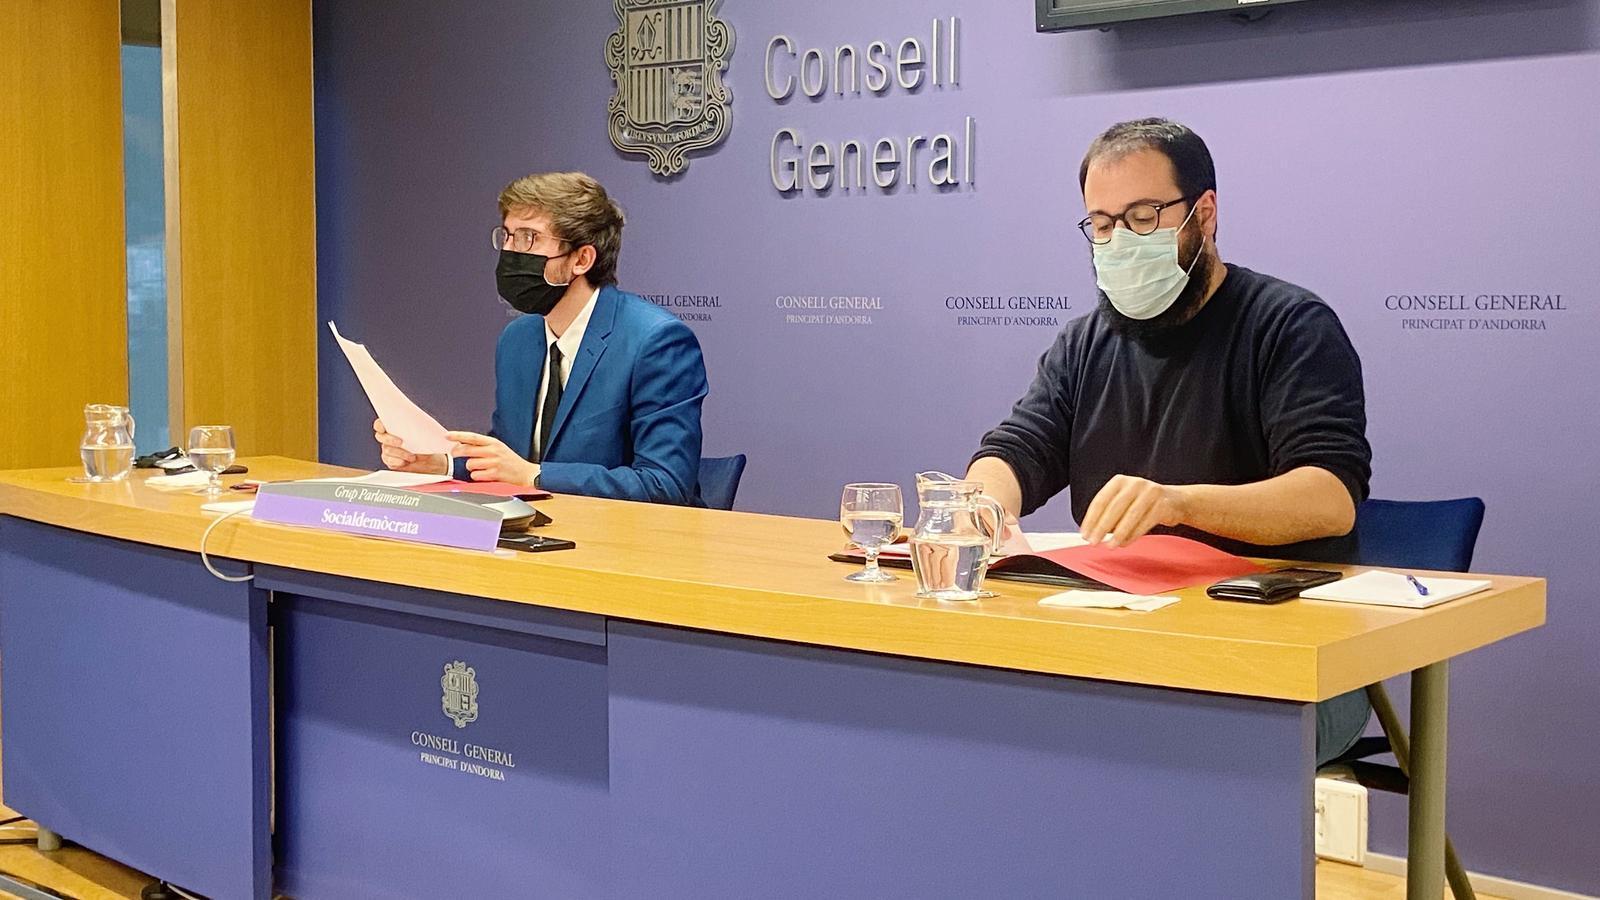 Els consellers Roger Padreny i Carles Sánchez. / PS